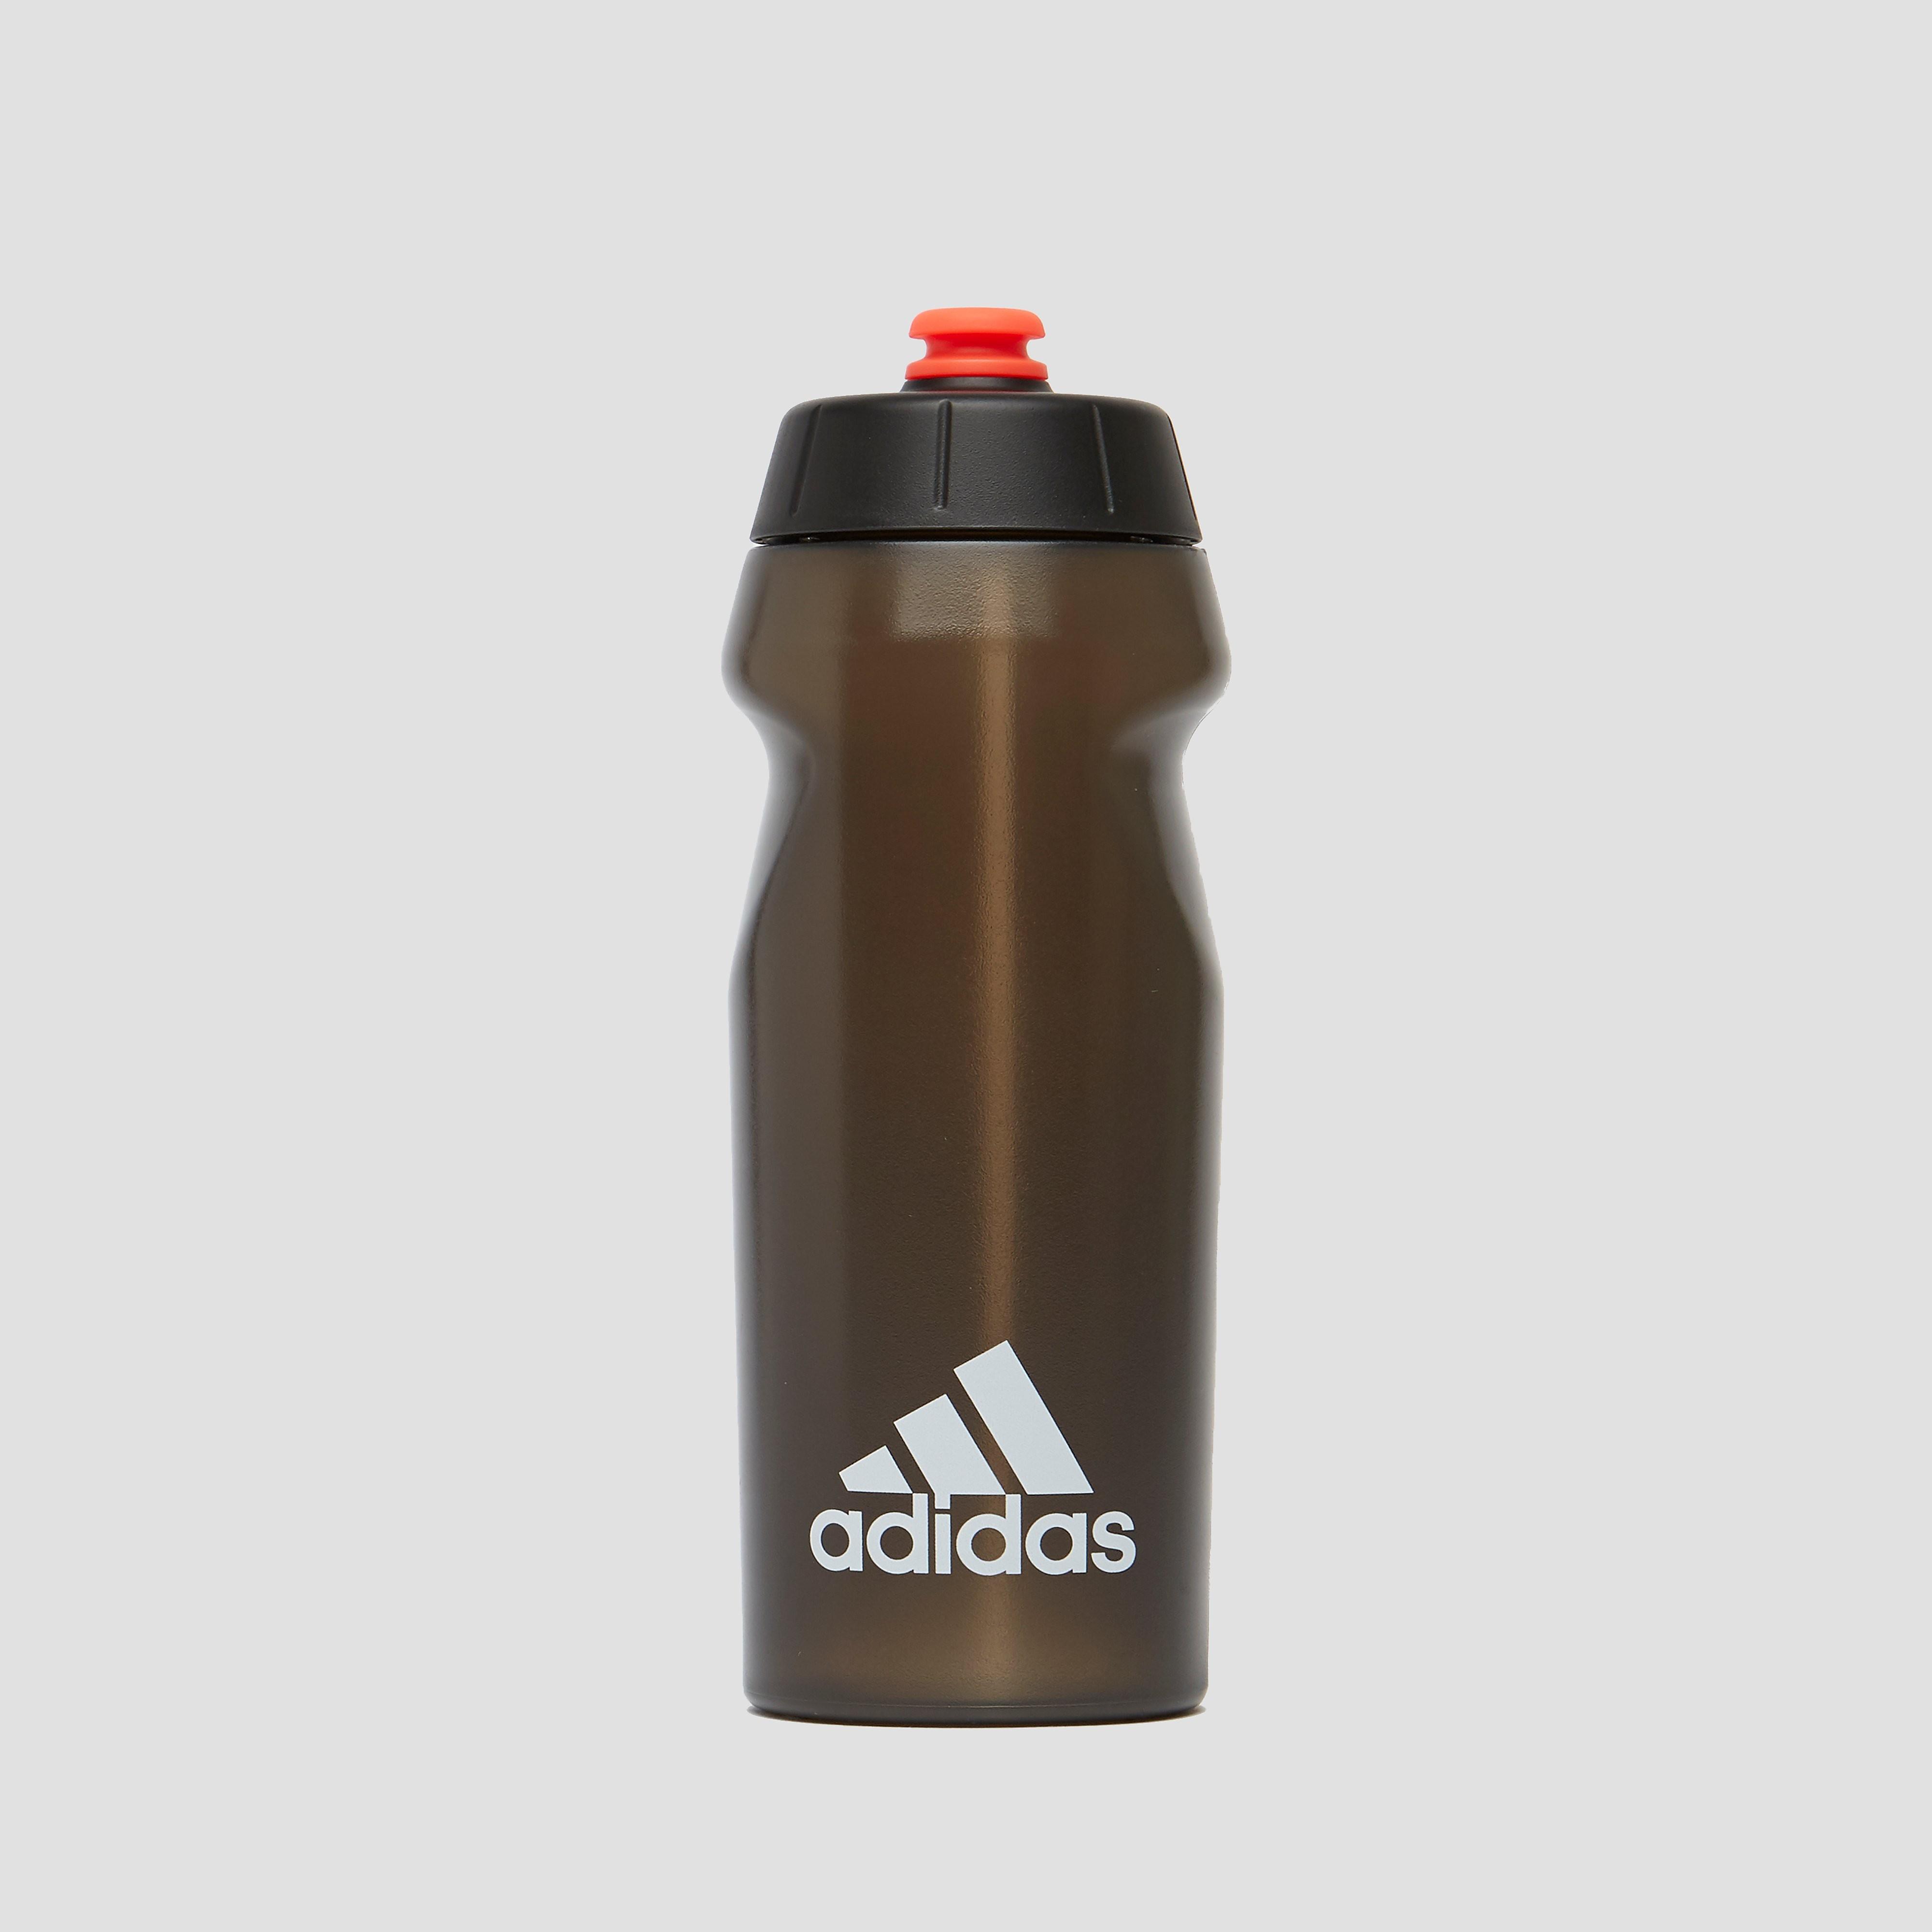 adidas Adidas performance bidon 0,5 liter wit/zwart kinderen